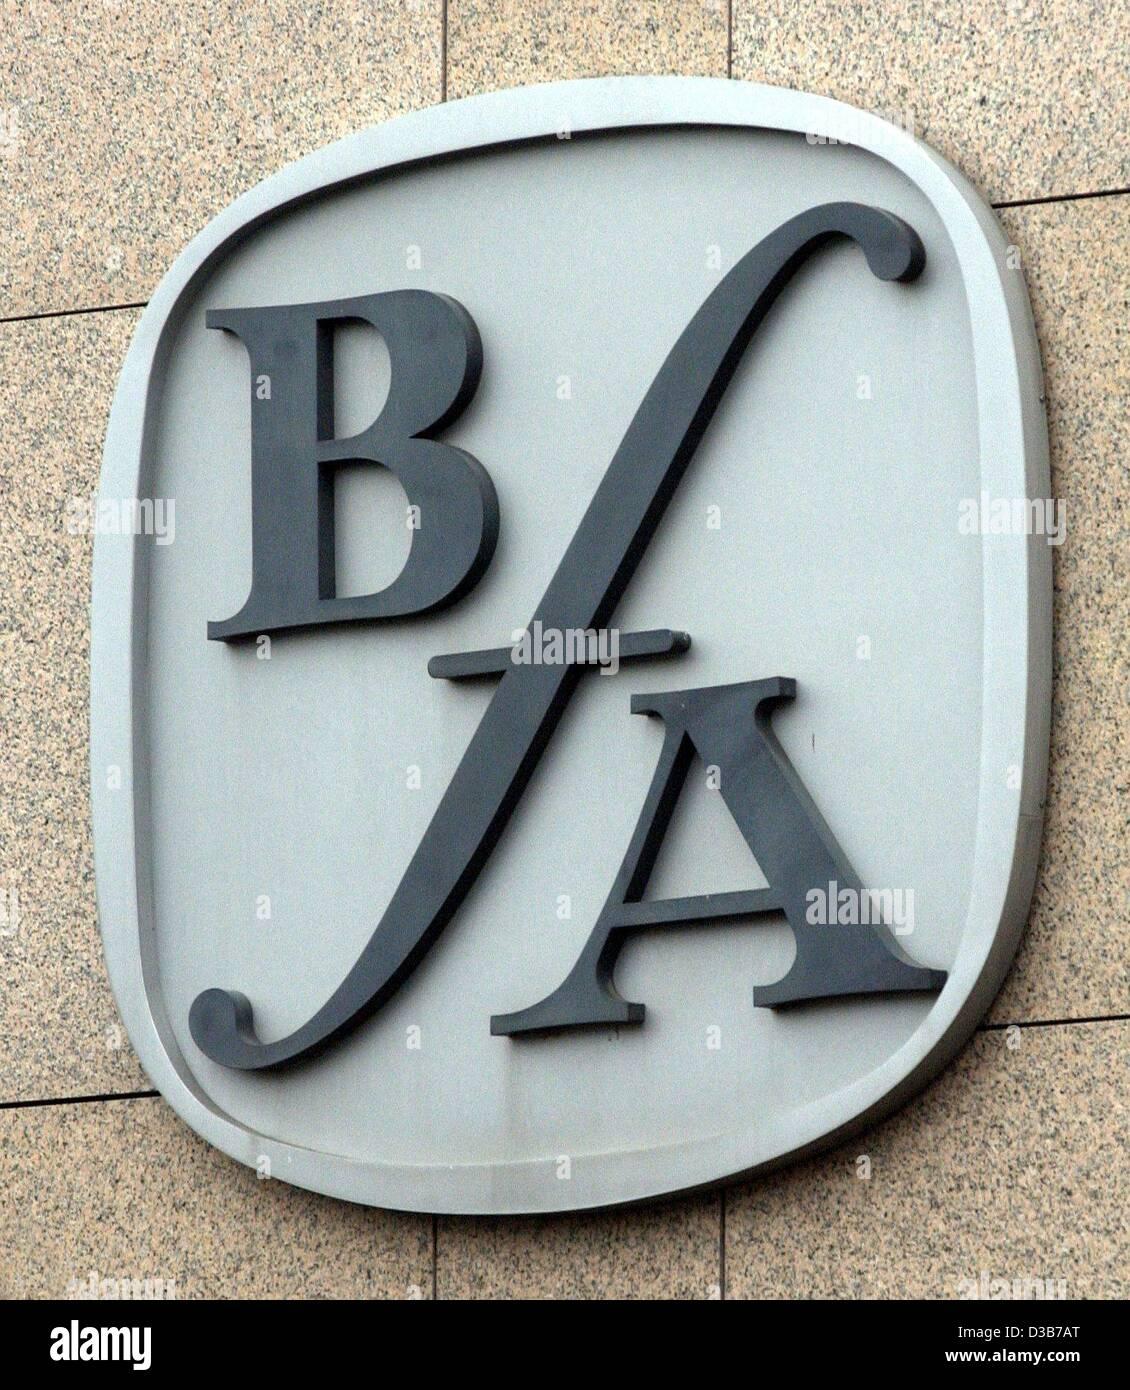 (dpa) - The logo of the federal insurance institution for employees (Bundesversicherungsanstalt fuer Angestellte, Stock Photo